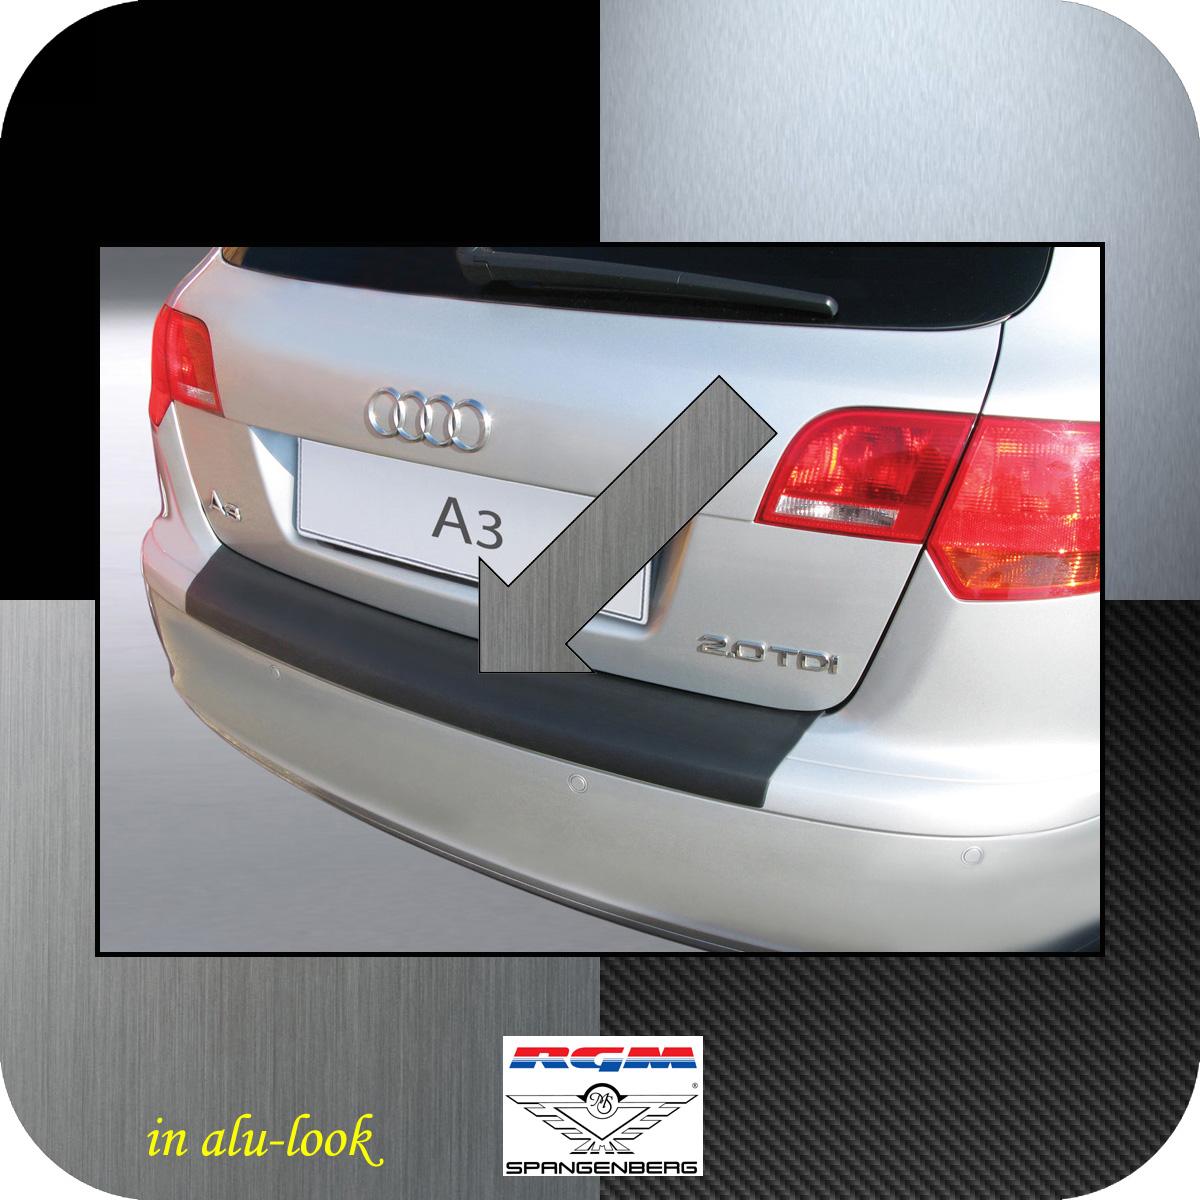 Ladekantenschutz Alu-Look Audi A3 Sportback vor facelift 2004-2008 3504361